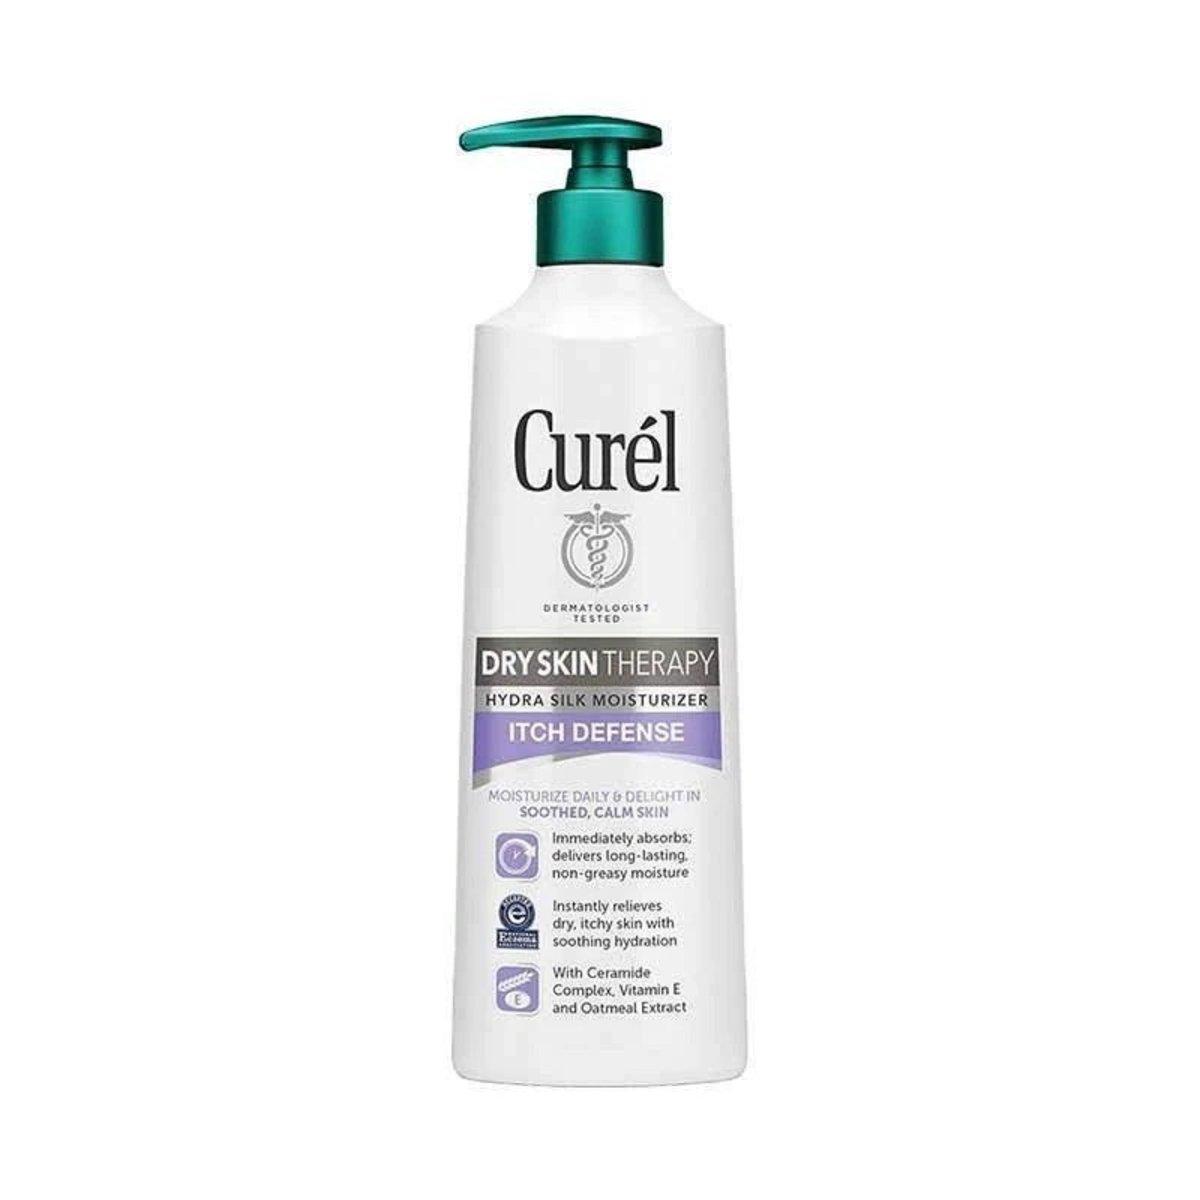 Dry Skin Therapy Hydra Silk Moisturizer Itch Defense 354ml